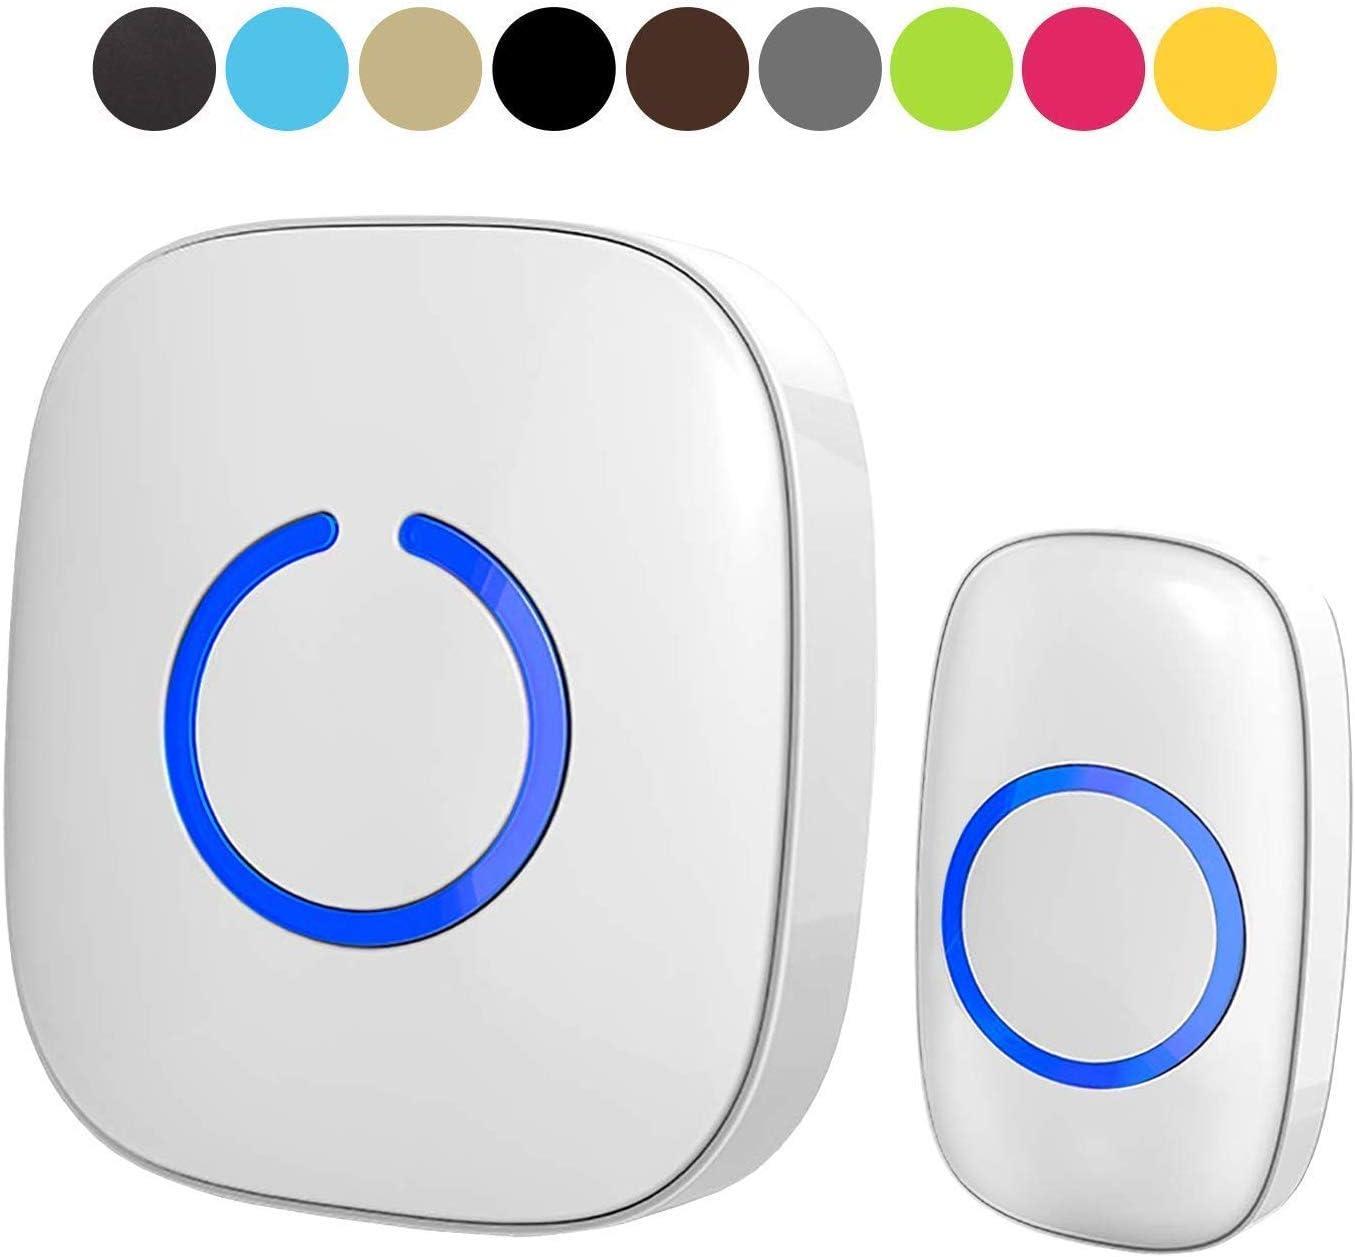 White Wireless doorbell